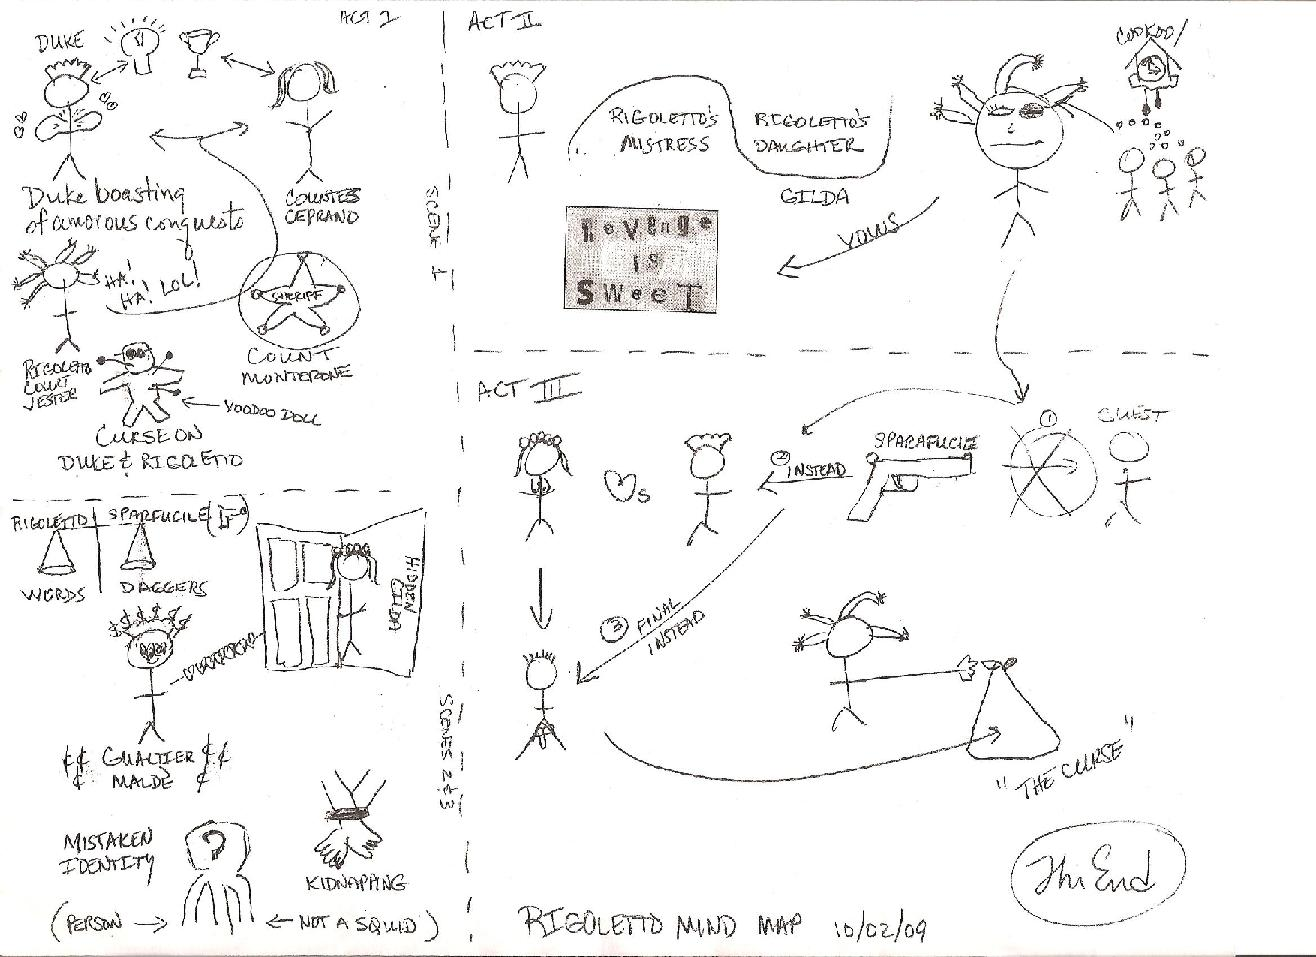 Mindmap of Rigoletto